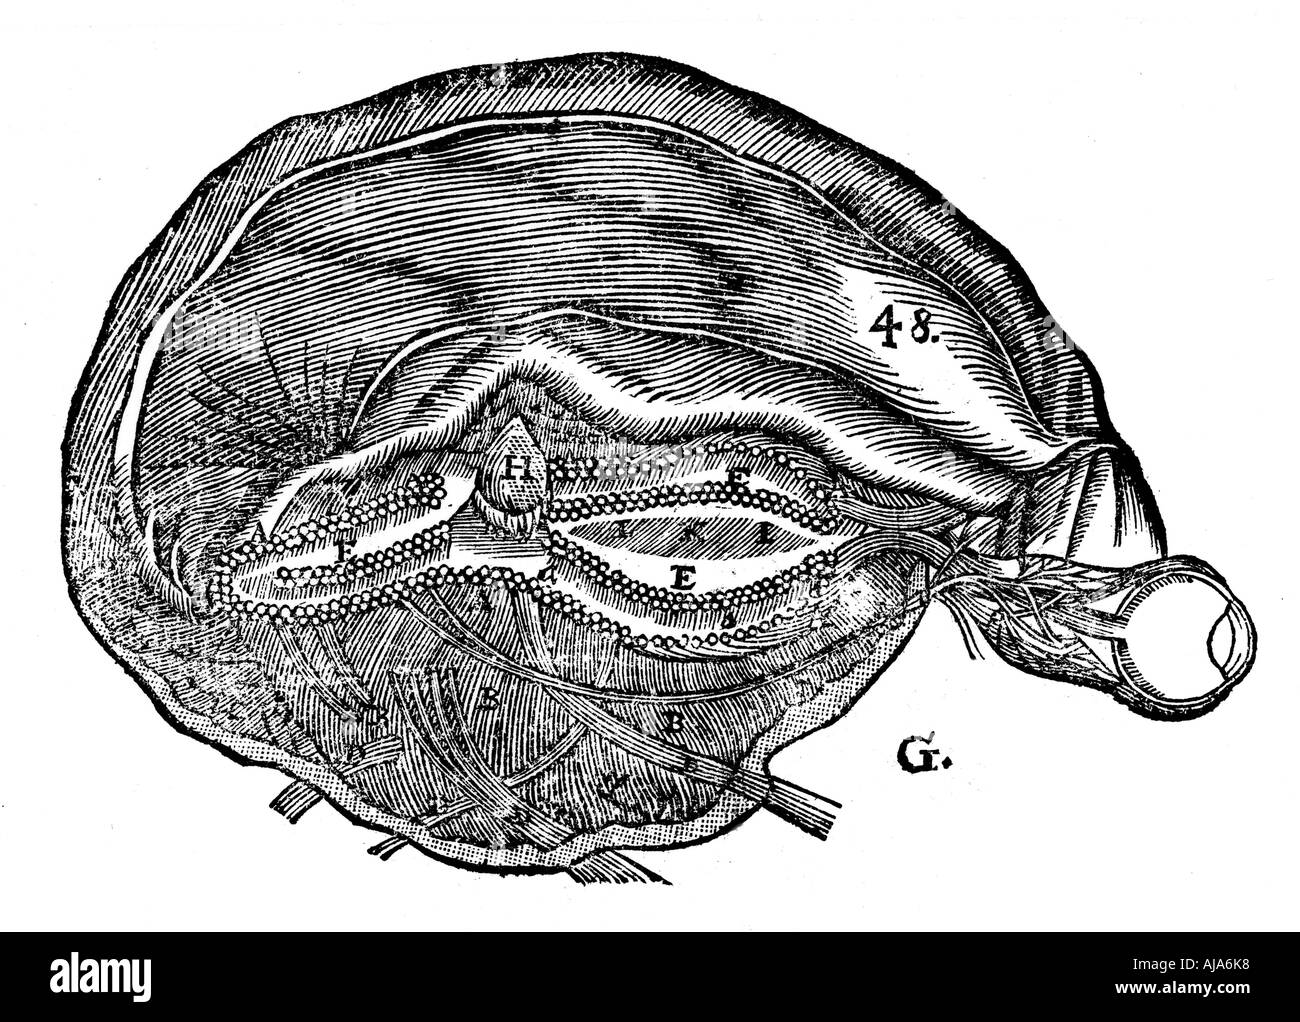 Rene Descartes diagram of the human brain and eye 1692 Stock Photo ...